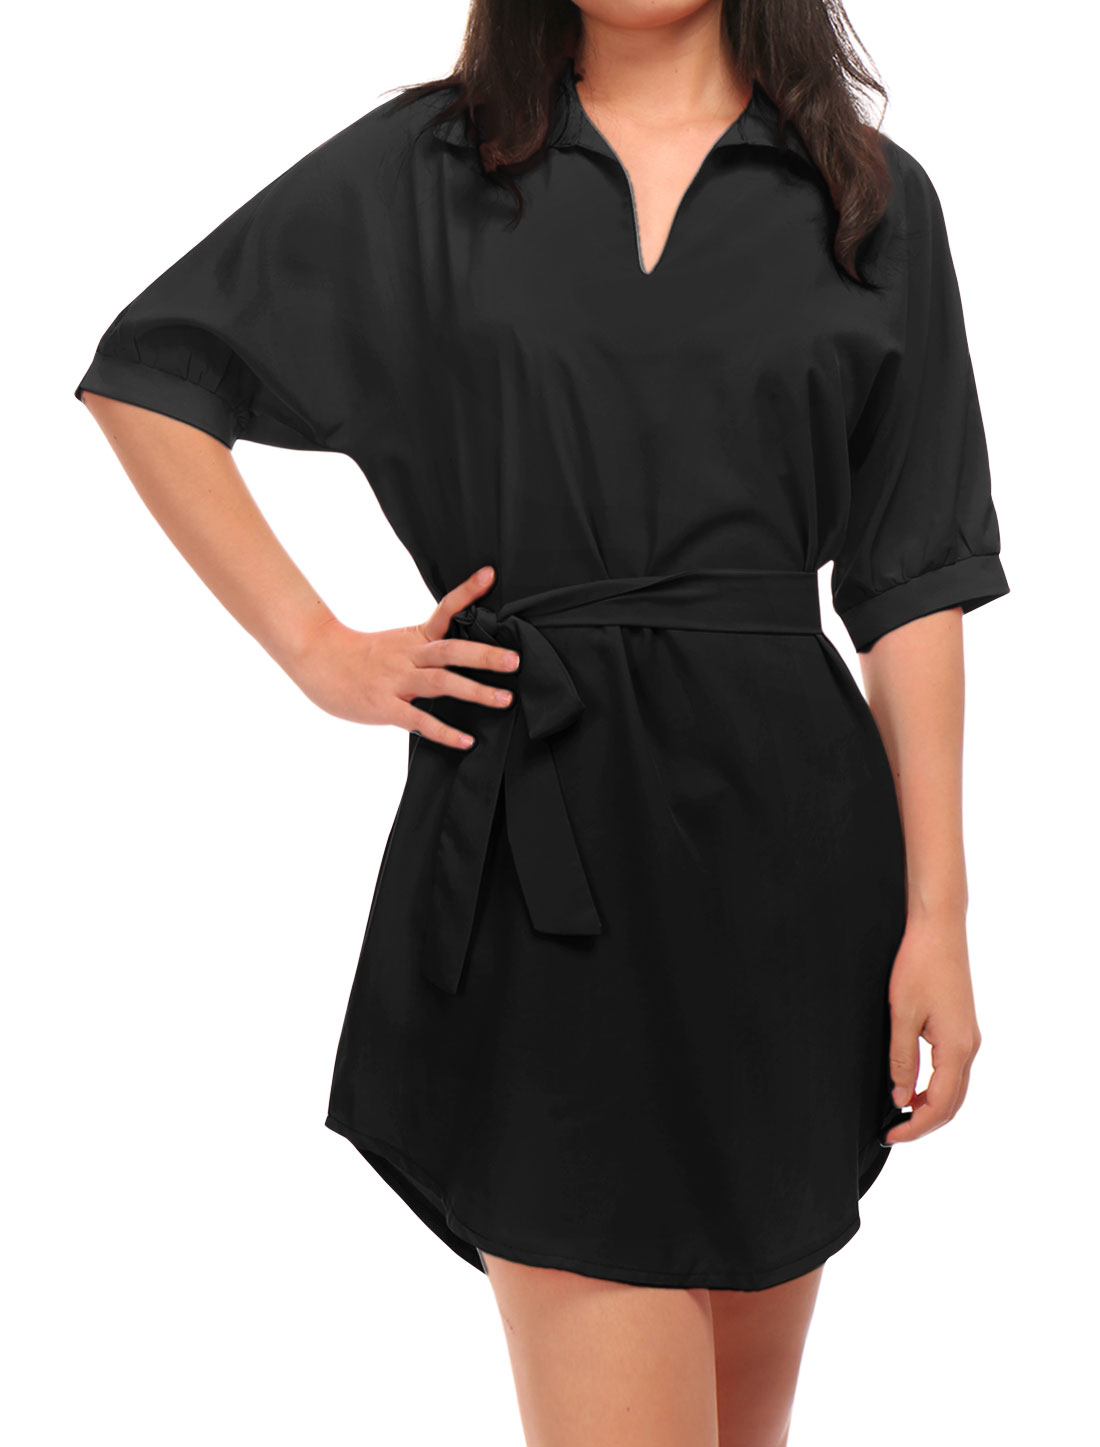 Women Point Collar Batwing Sleeves Round Hem Tunic Dress w Belt Black M